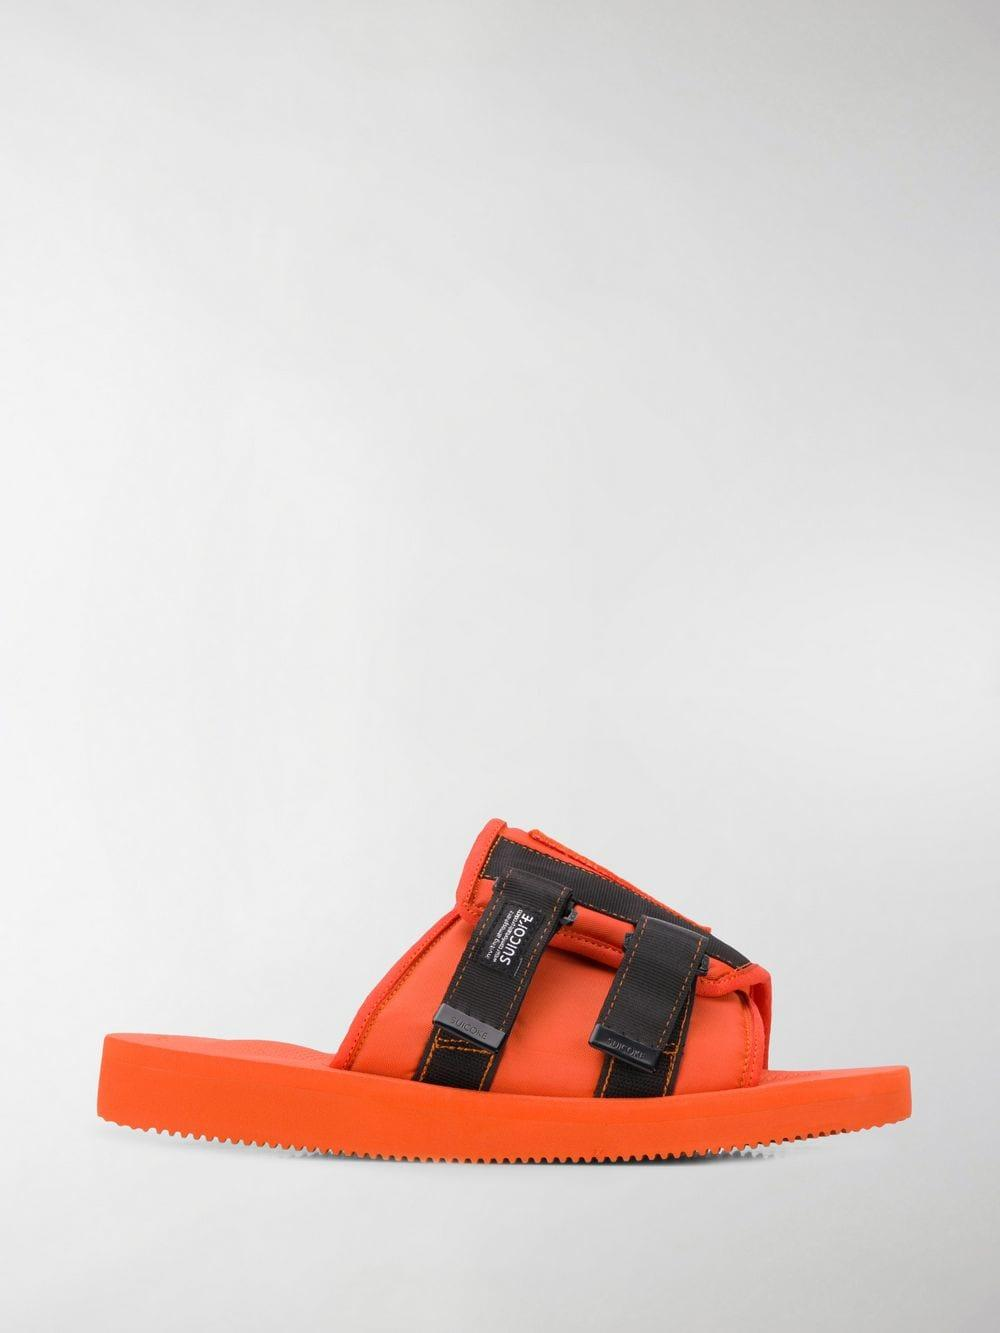 f804ffe6eca9 Lyst - Palm Angels Suicoke Patch Slider Sandals in Orange for Men ...